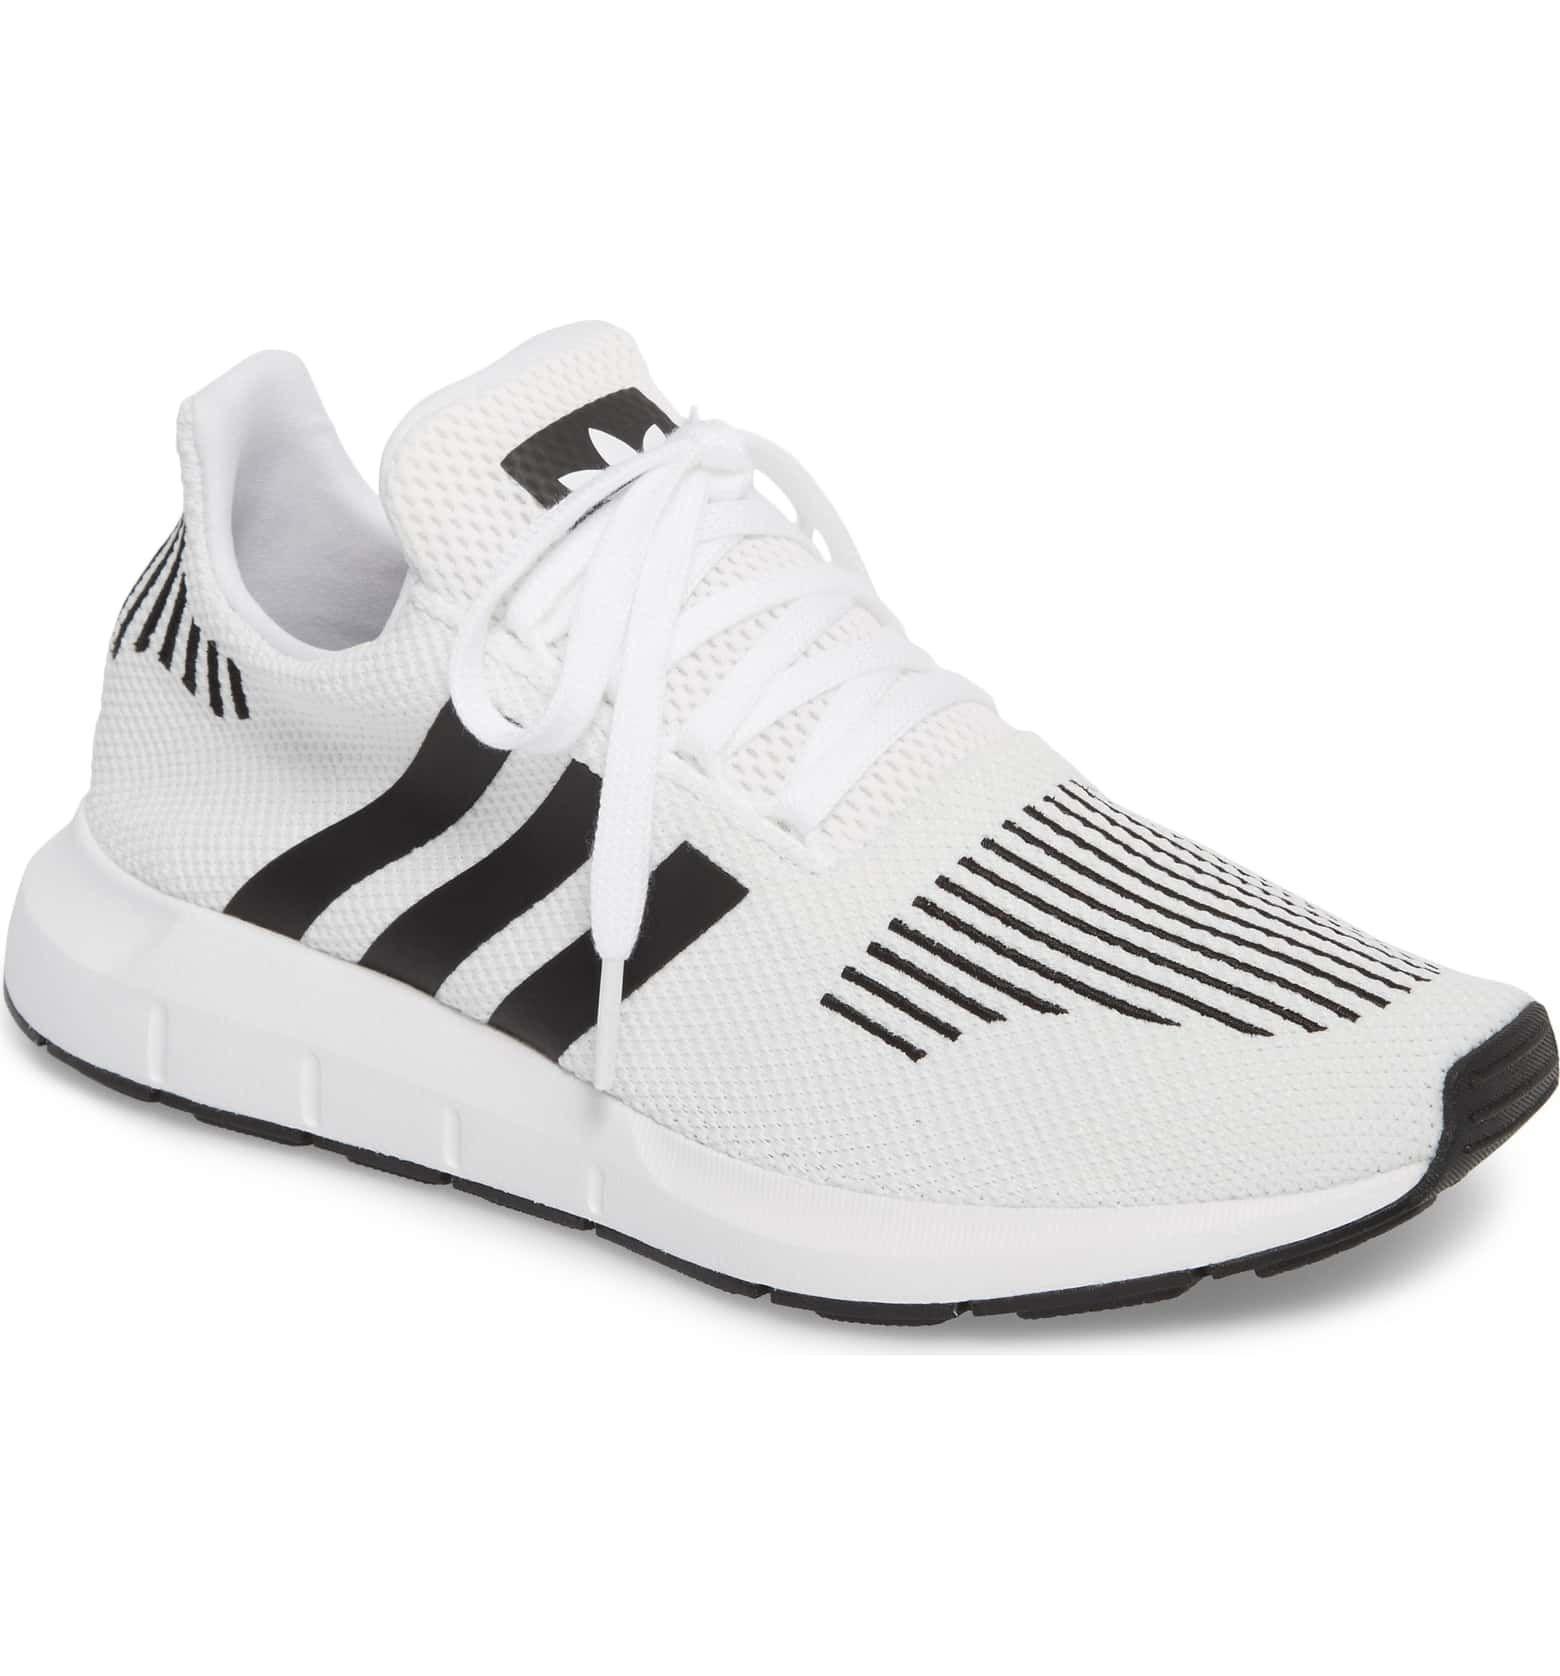 Adidas Swift Run Sneaker Women Nordstrom Sneakers Womens Sneakers Nice Shoes